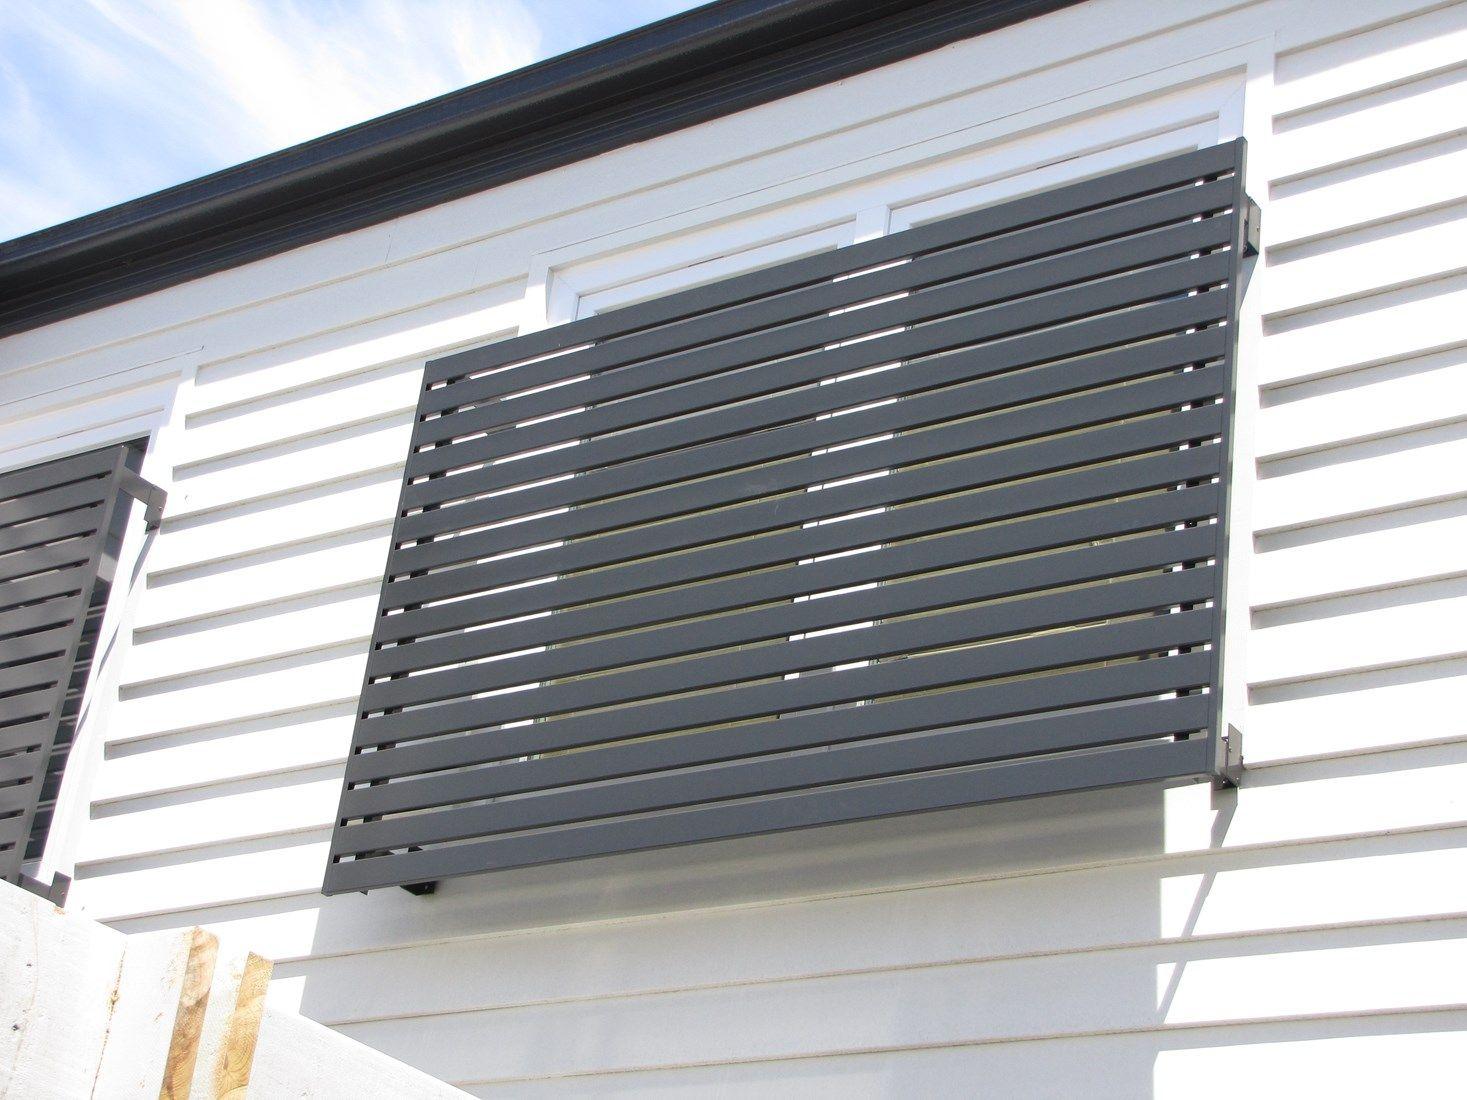 Bayside privacy screens install quality aluminium baton